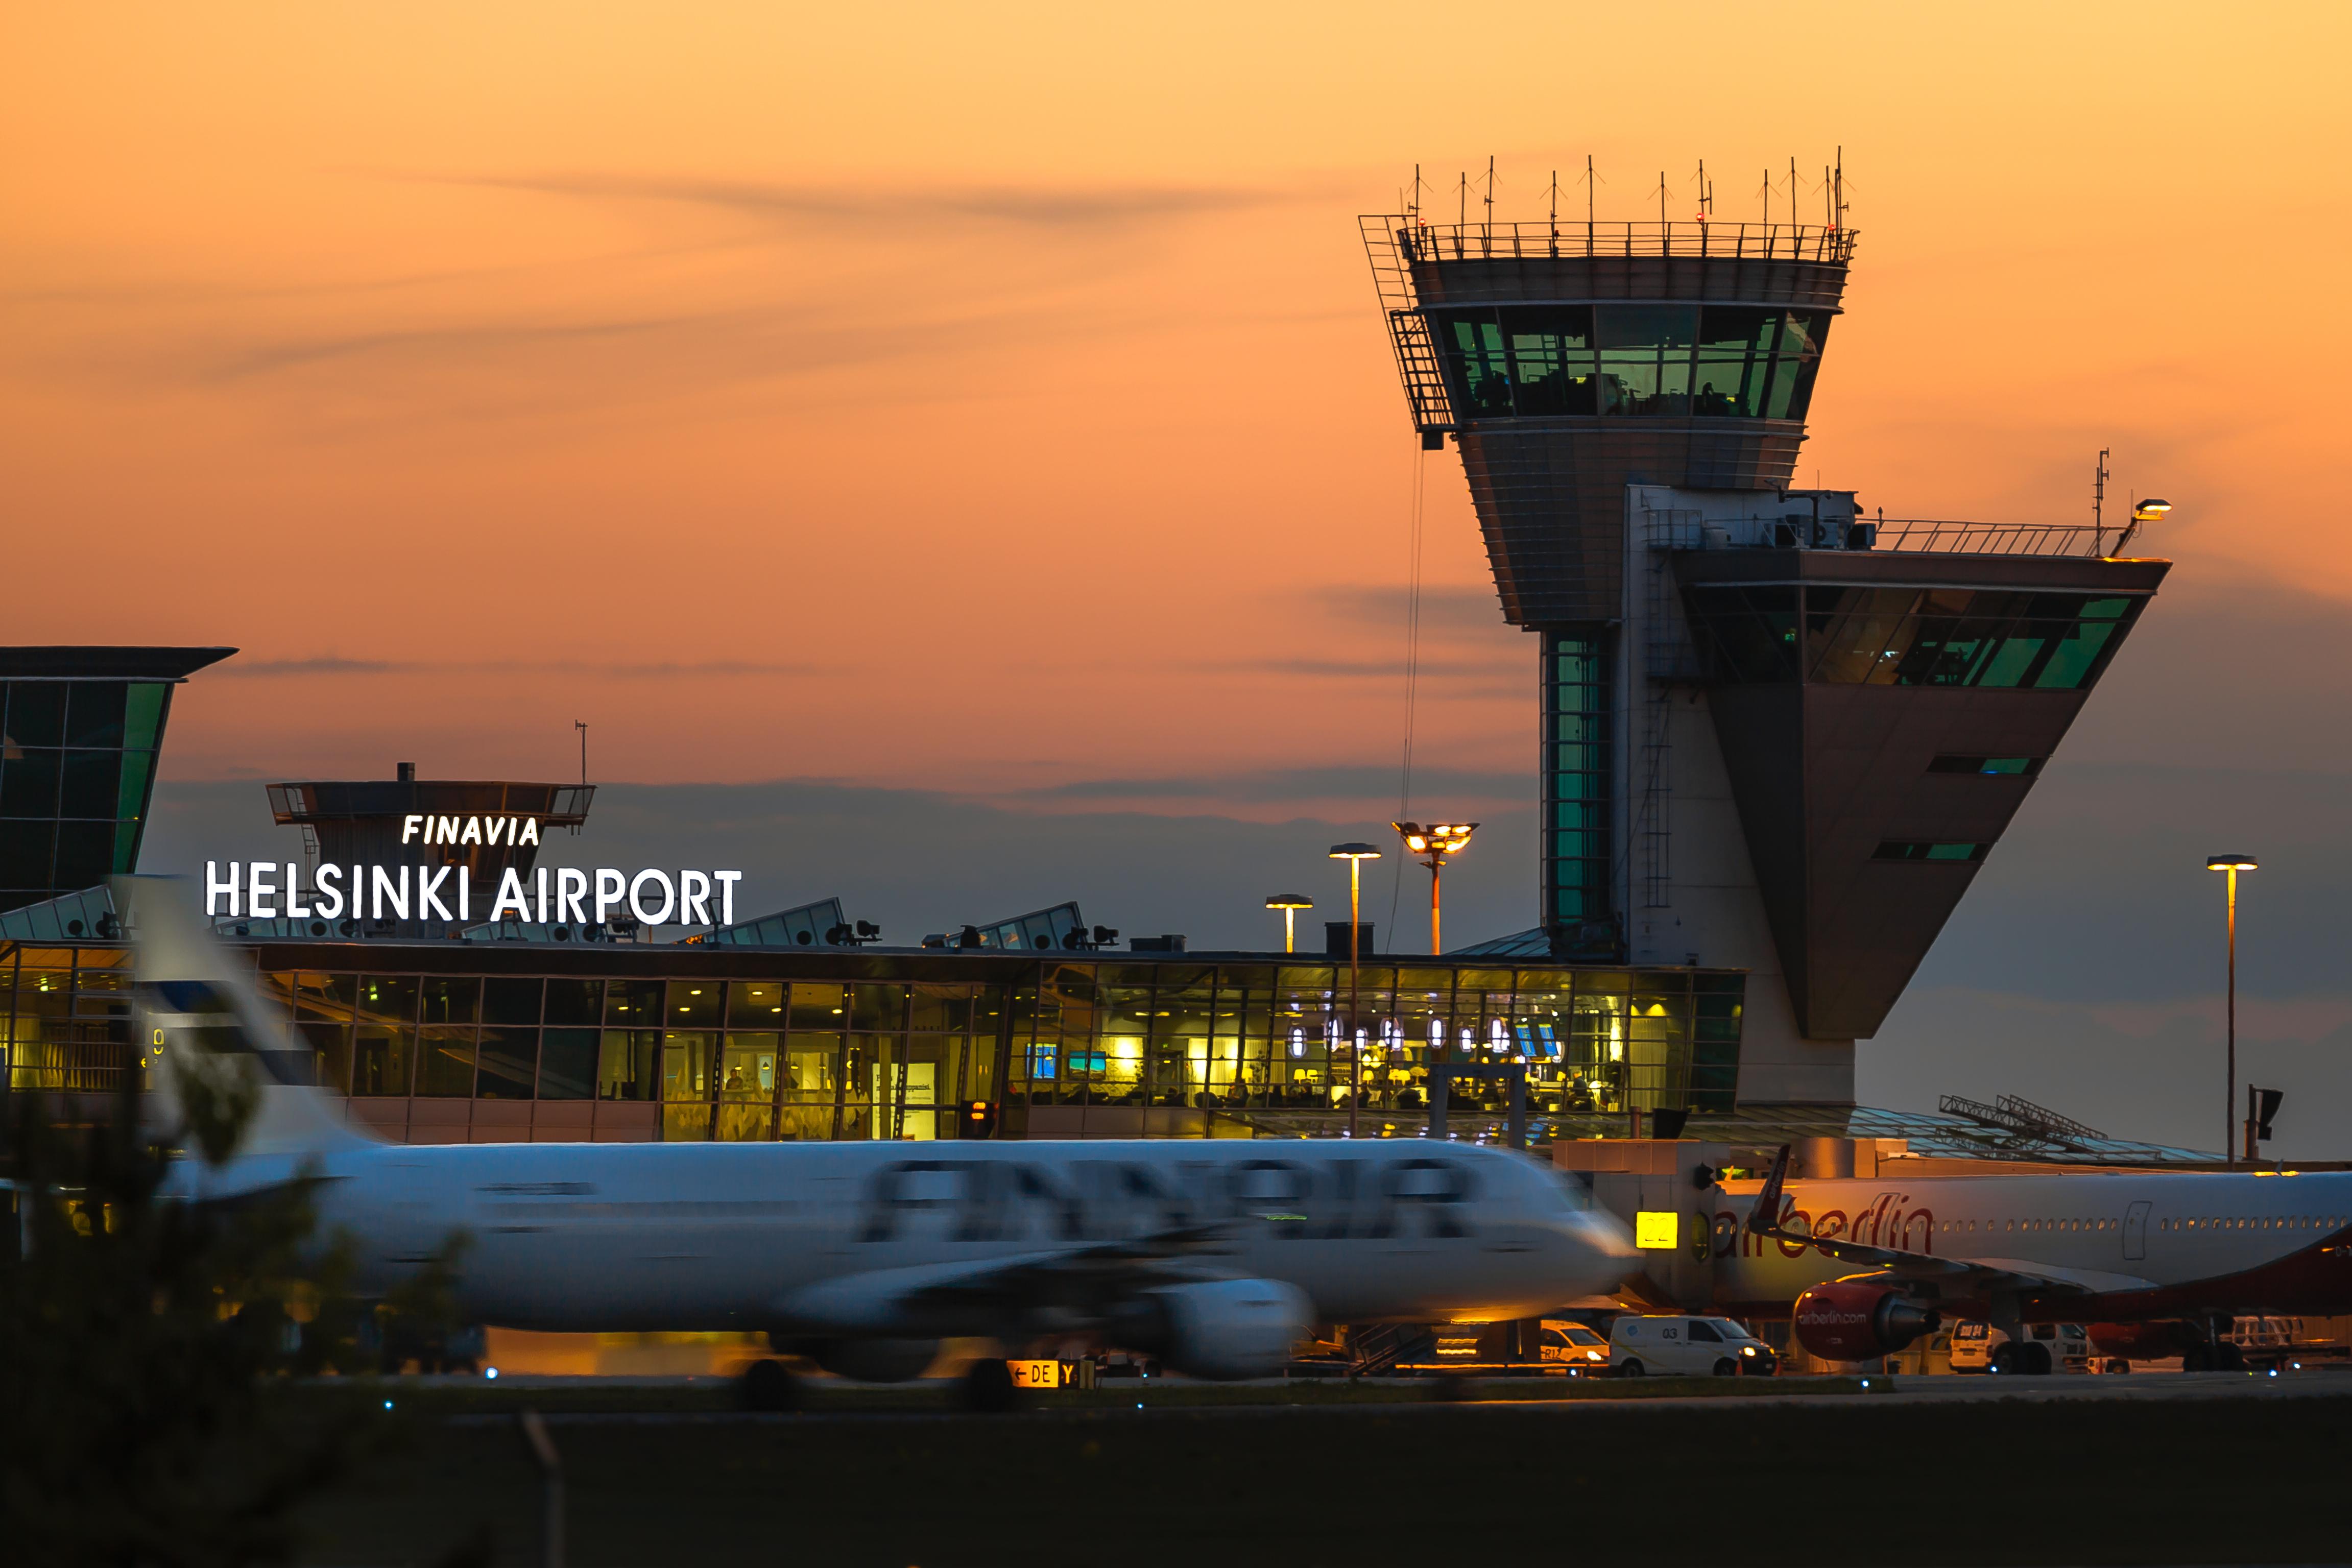 Finavia Helsinki Airport exterior